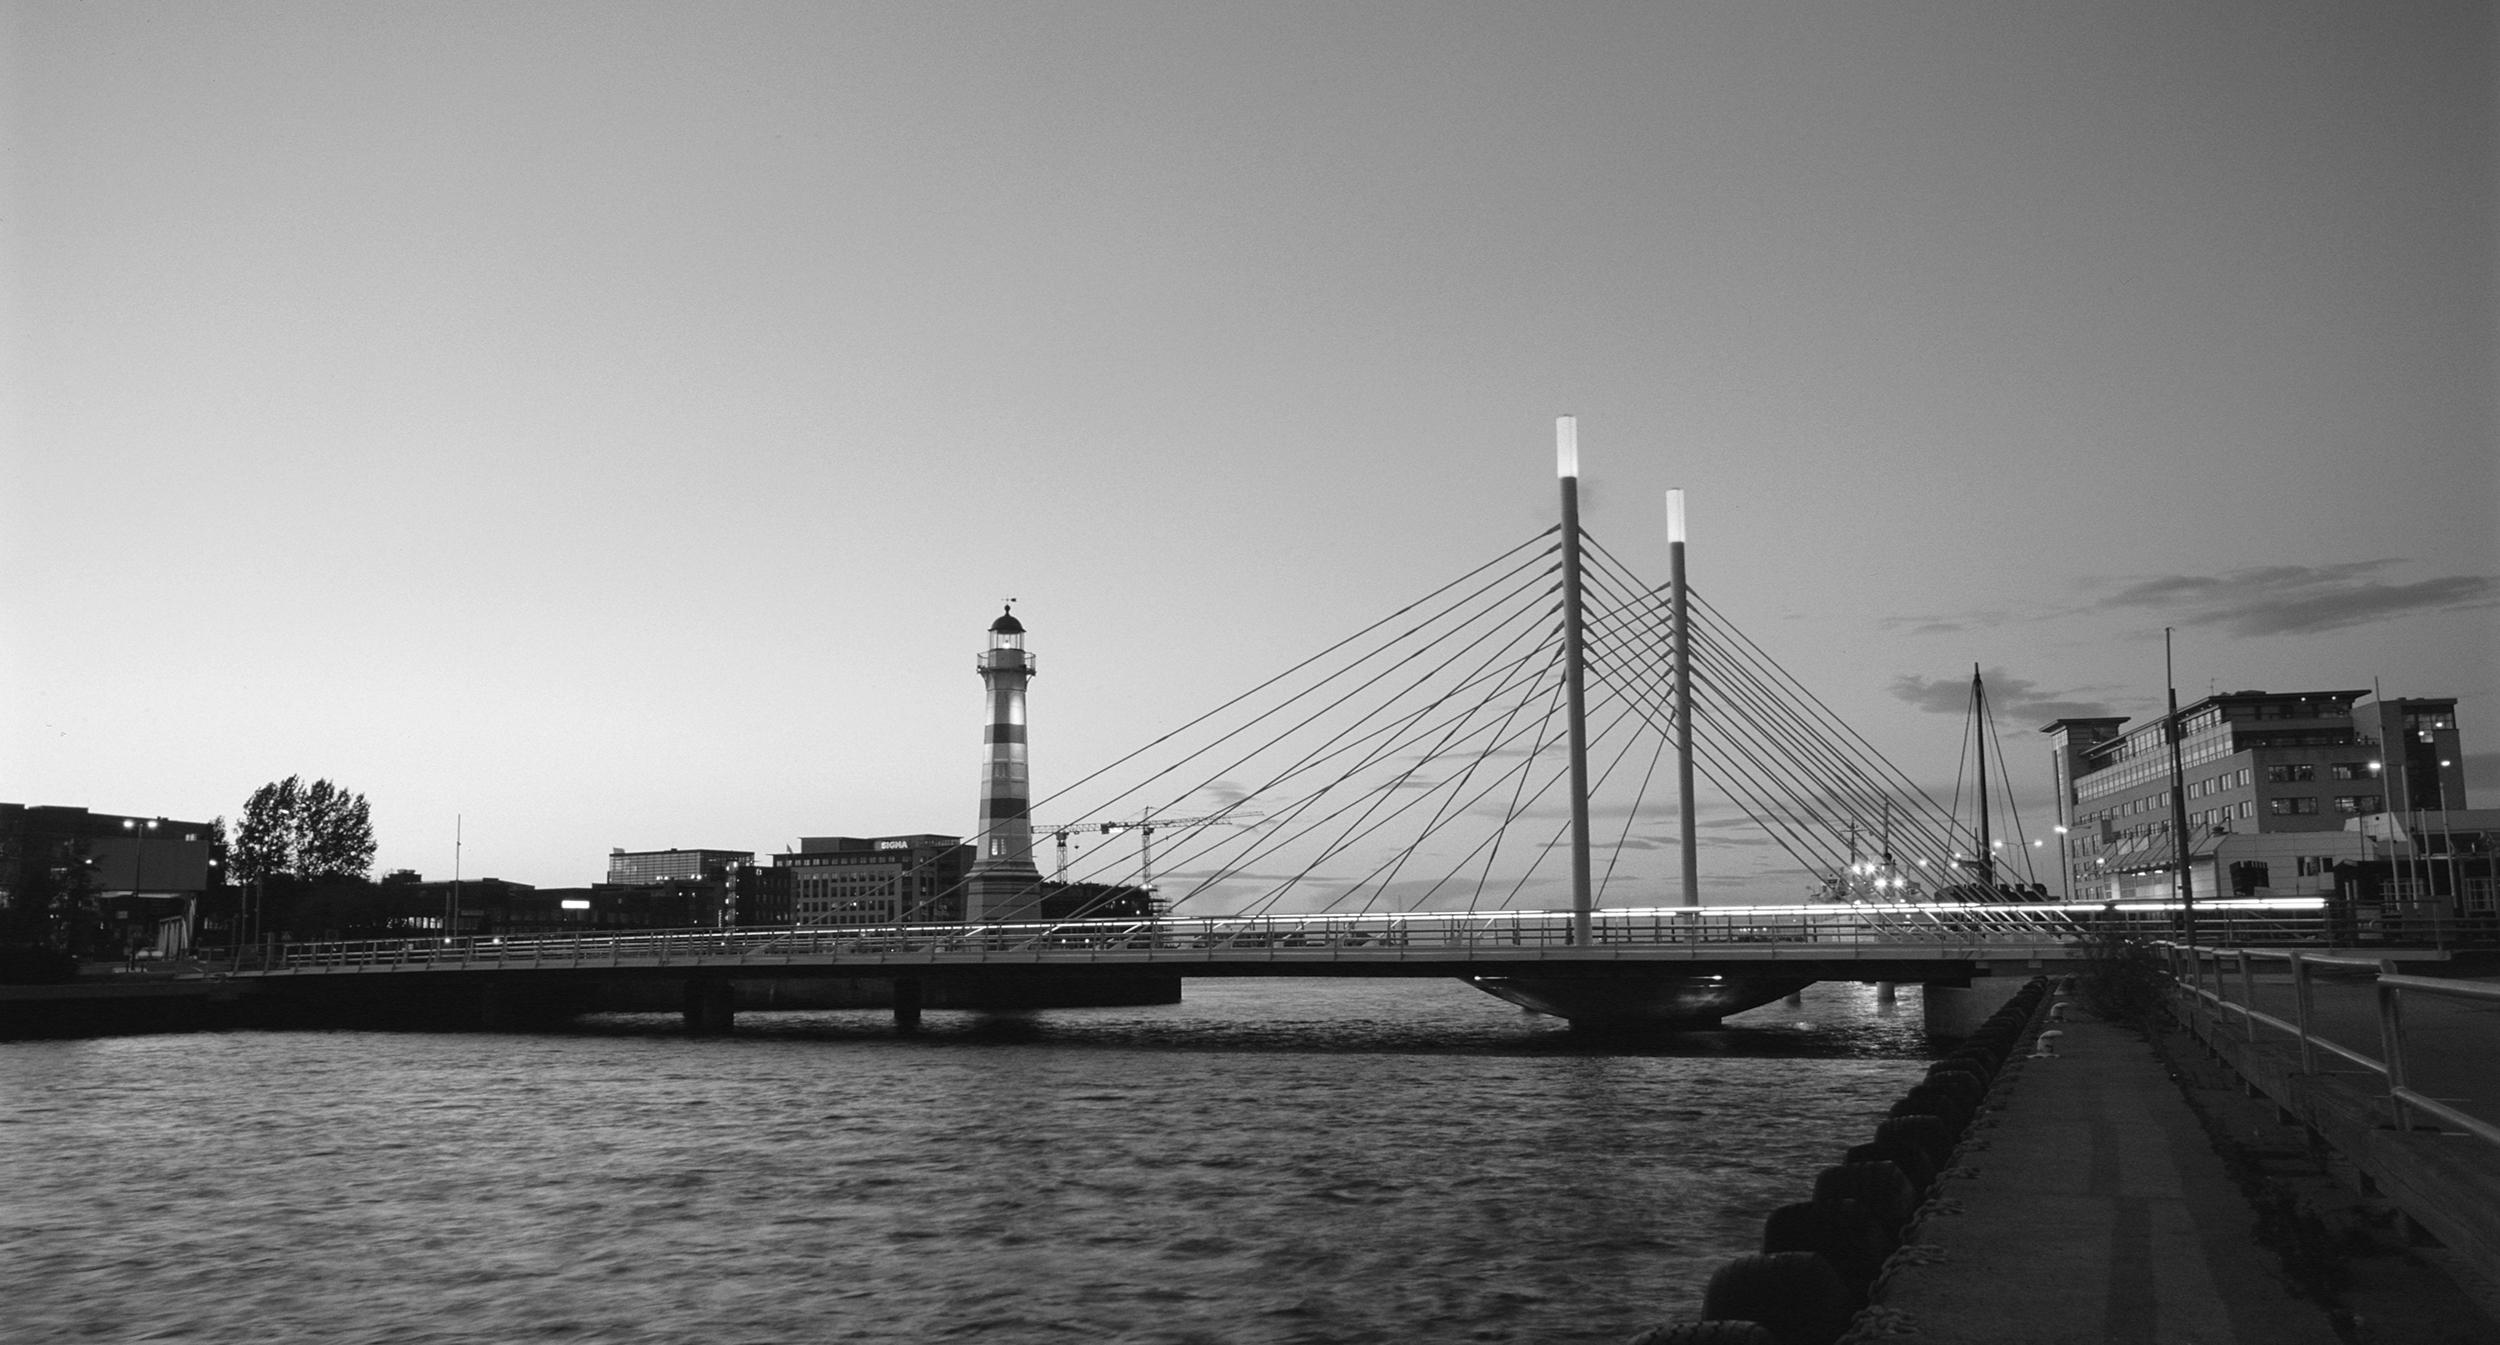 Beautiful Architecture Award, The City of Malmö 2005    The University Bridge  receive the Beautiful Architecture Award, given by the City of Malmö for the bridge's impact on the urban environment.